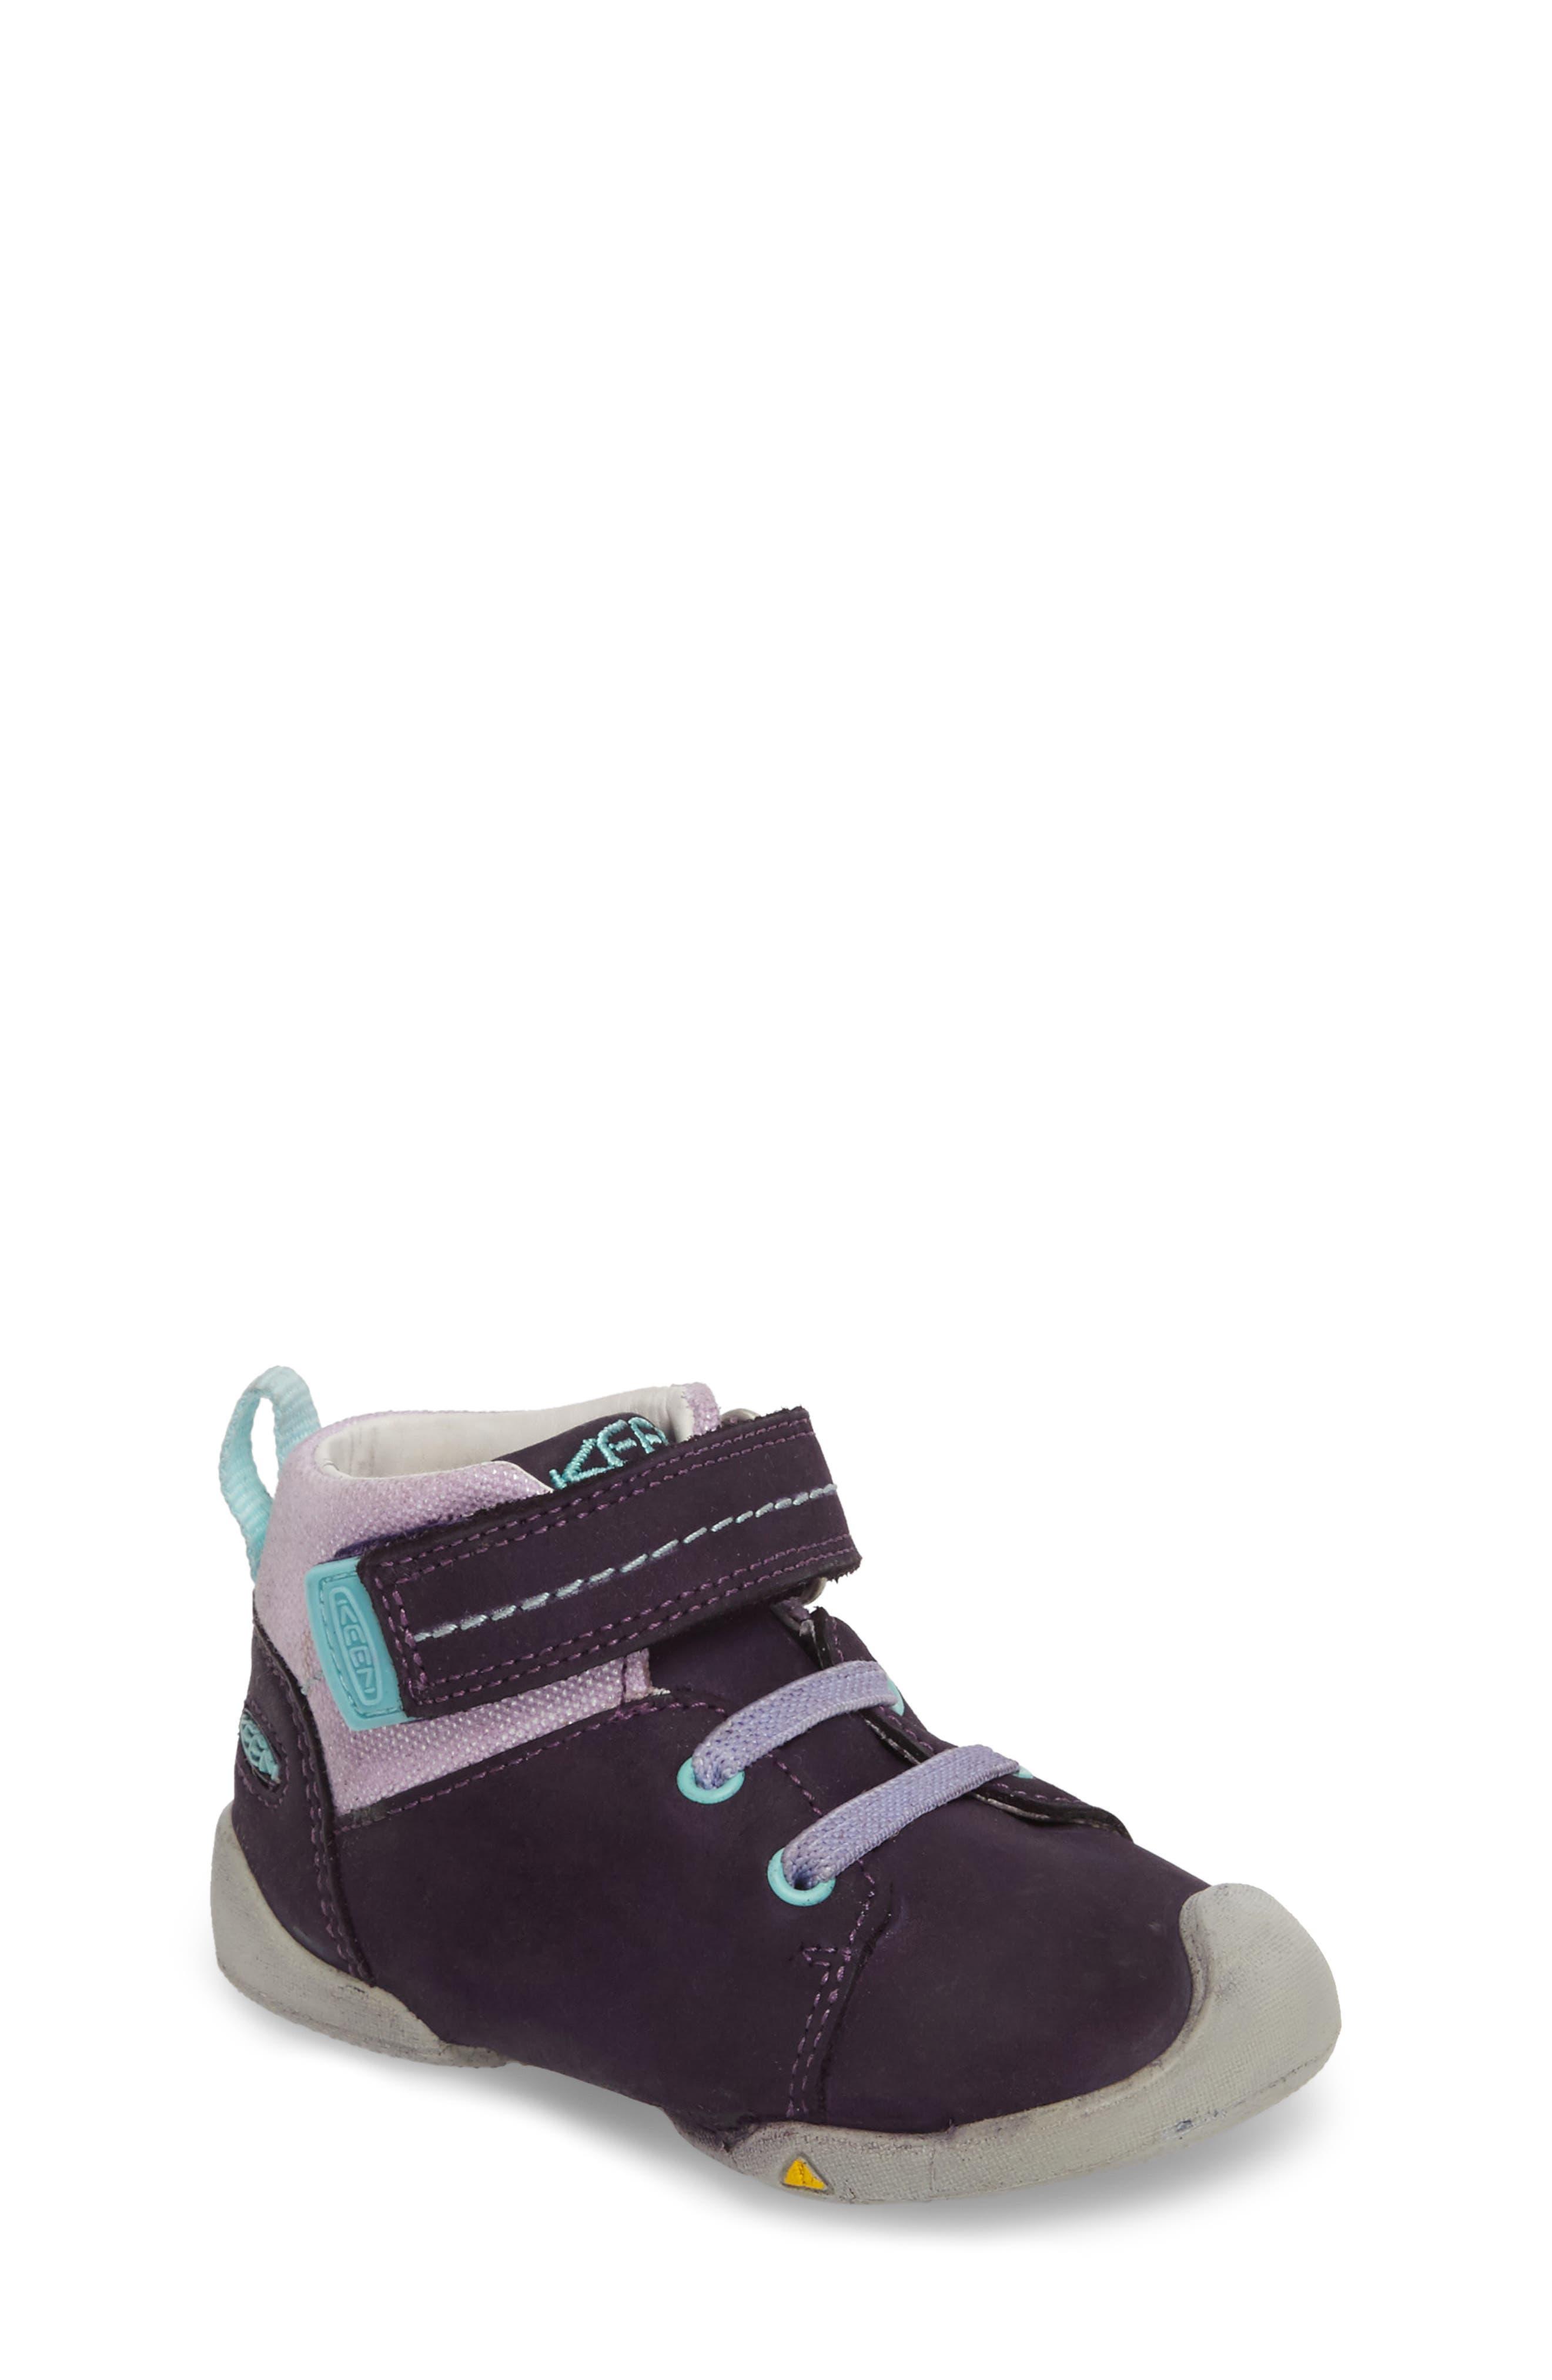 Pep Mid-T Sneaker,                             Main thumbnail 1, color,                             Plumeria/ Sweet Lavendar